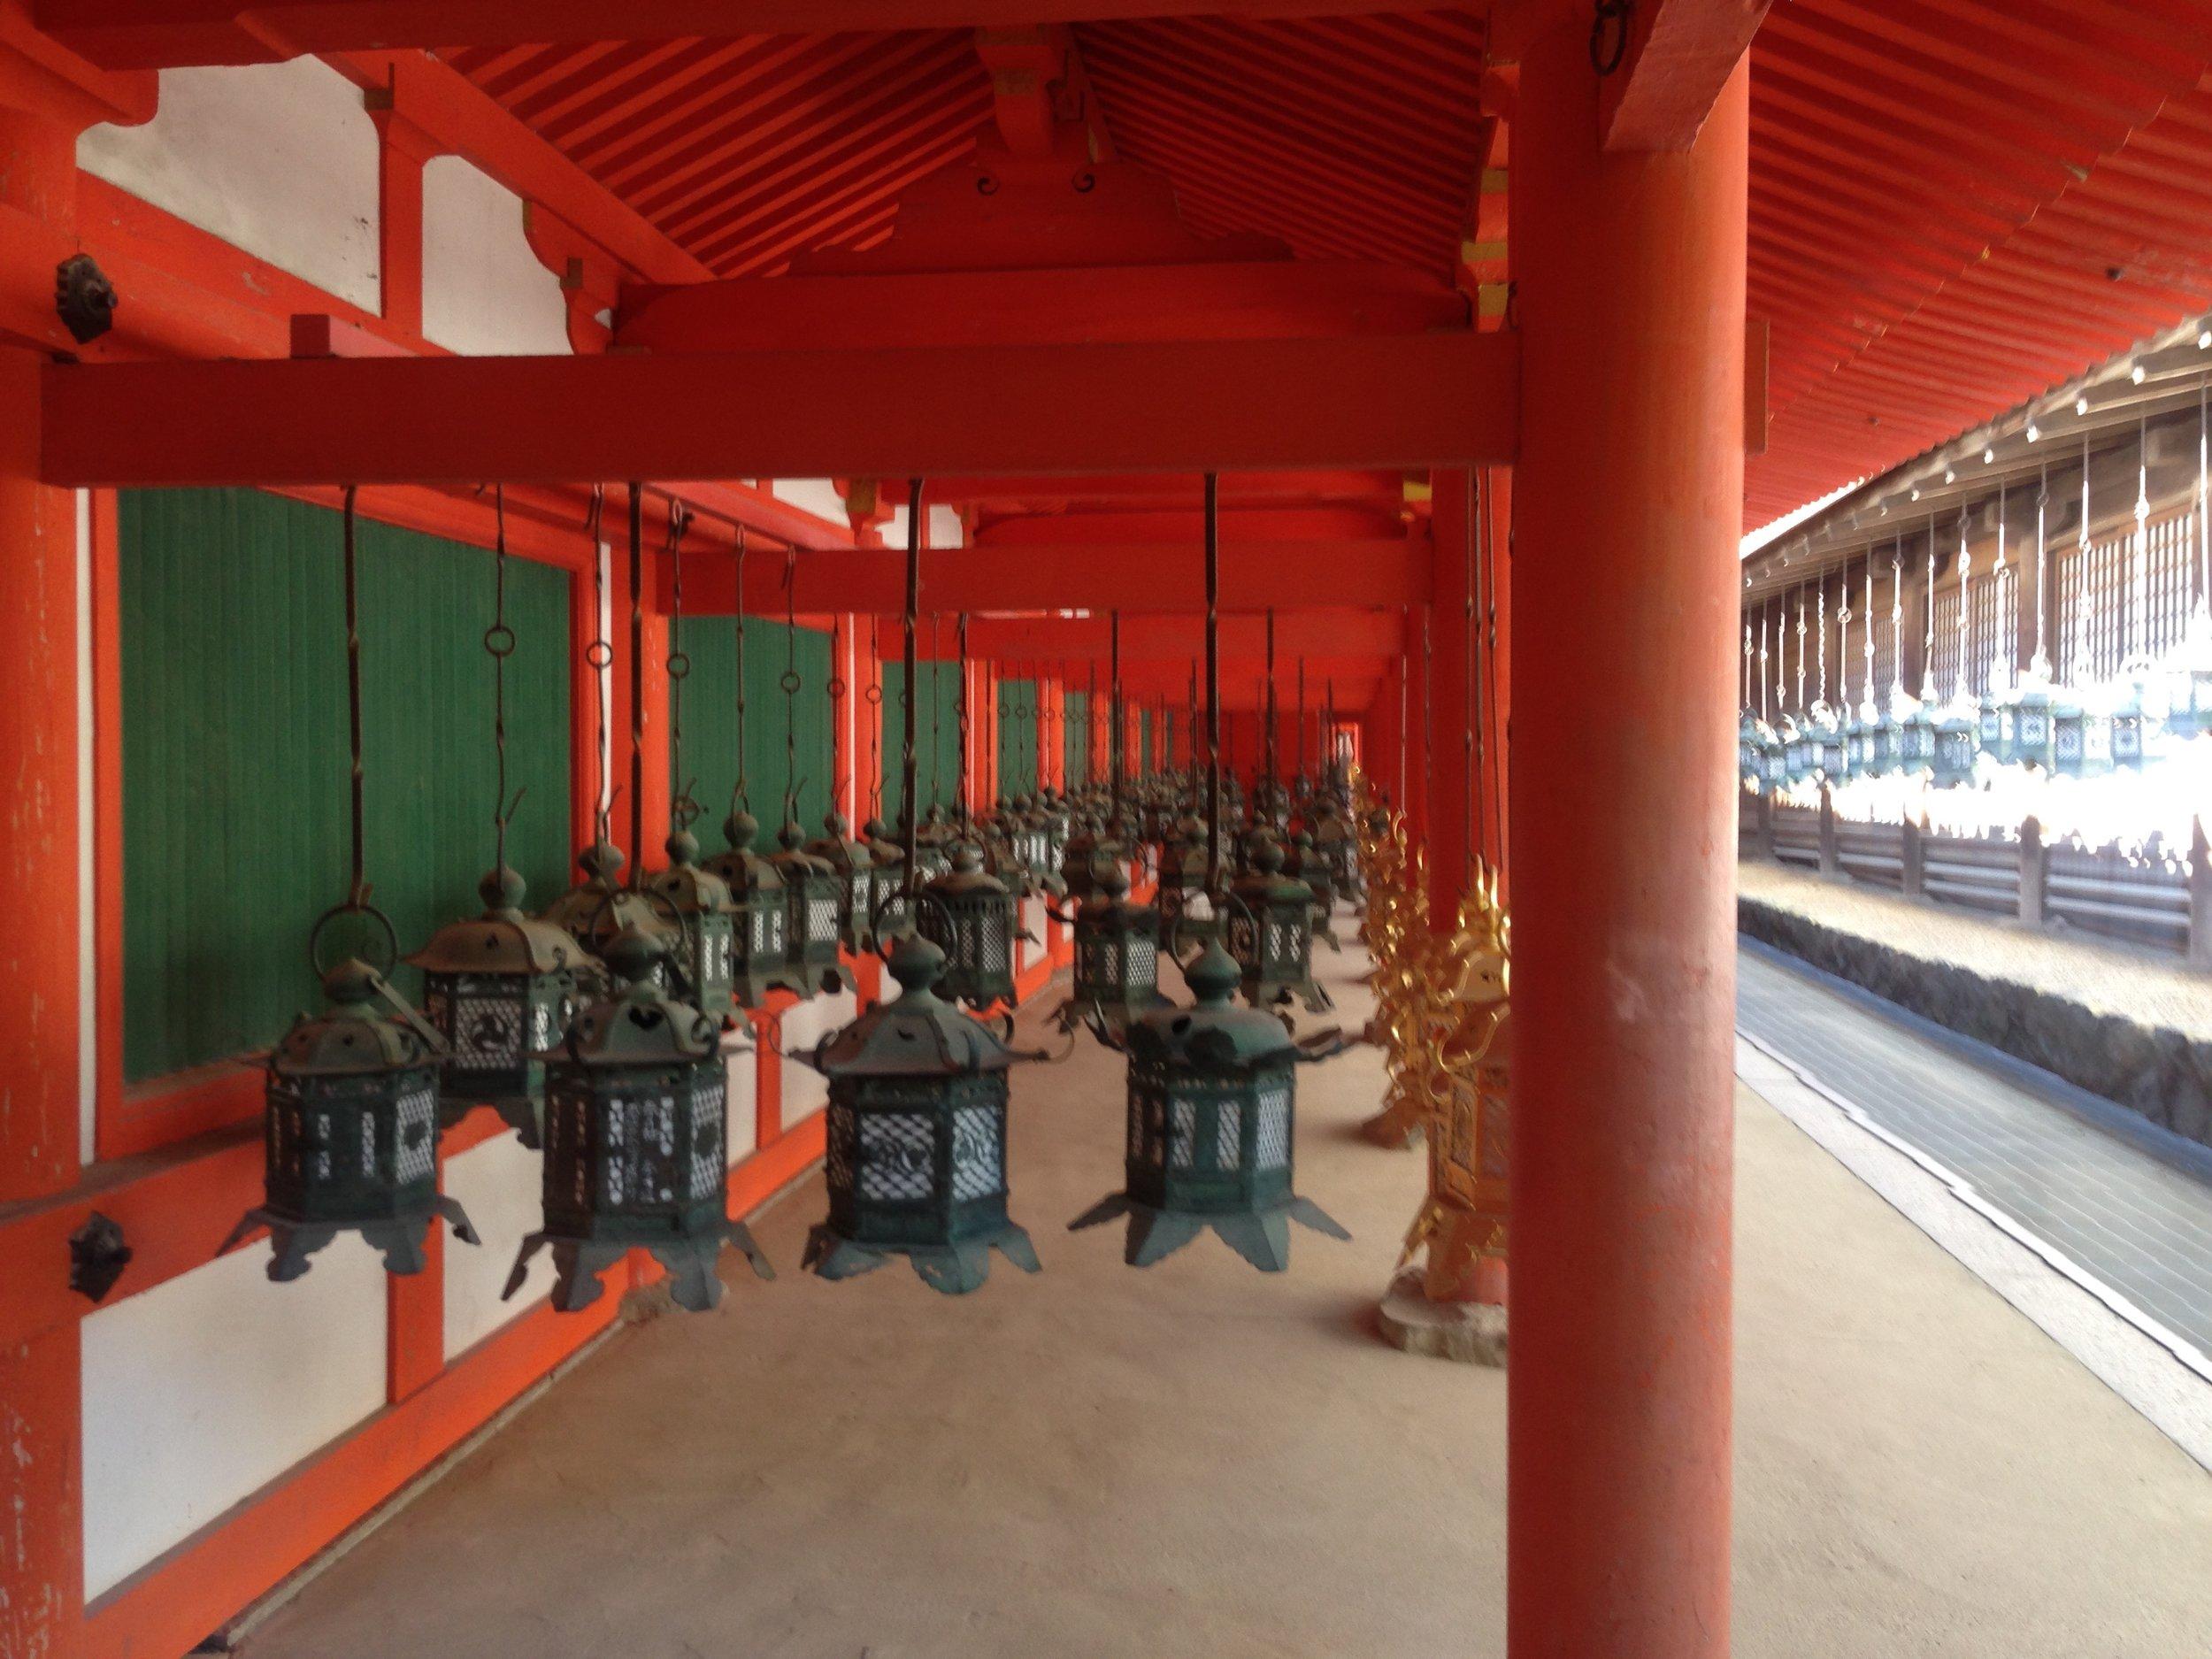 The lanterns hung so still! Beautiful shrine.